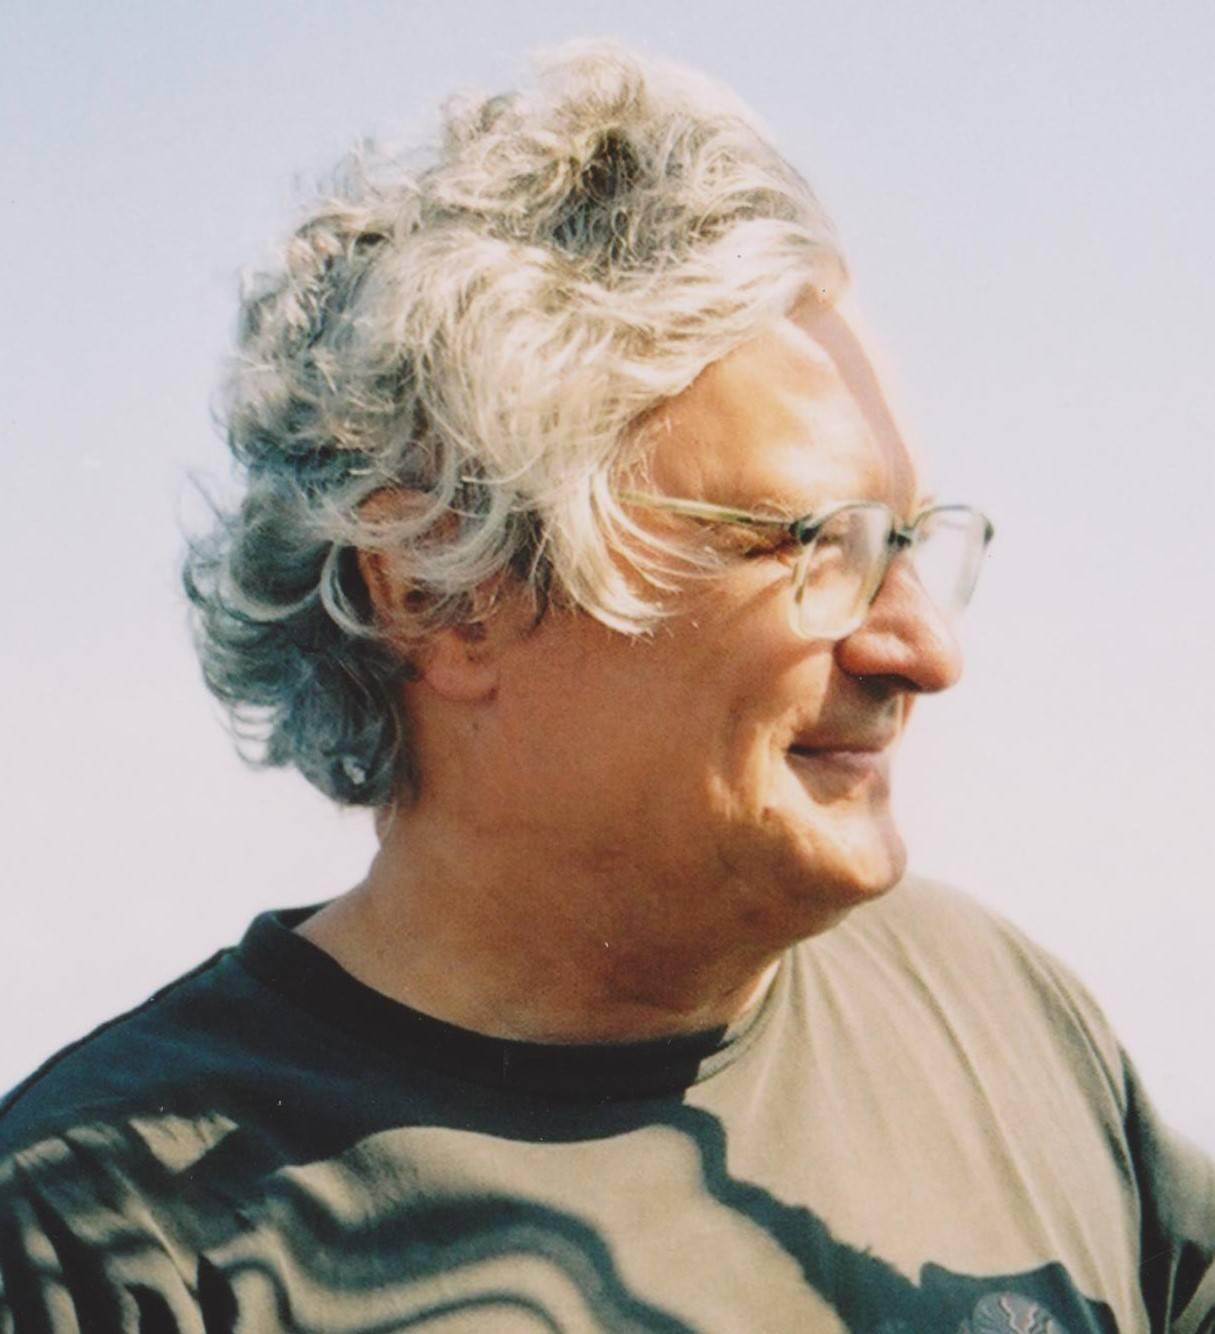 Philippe MOLLER